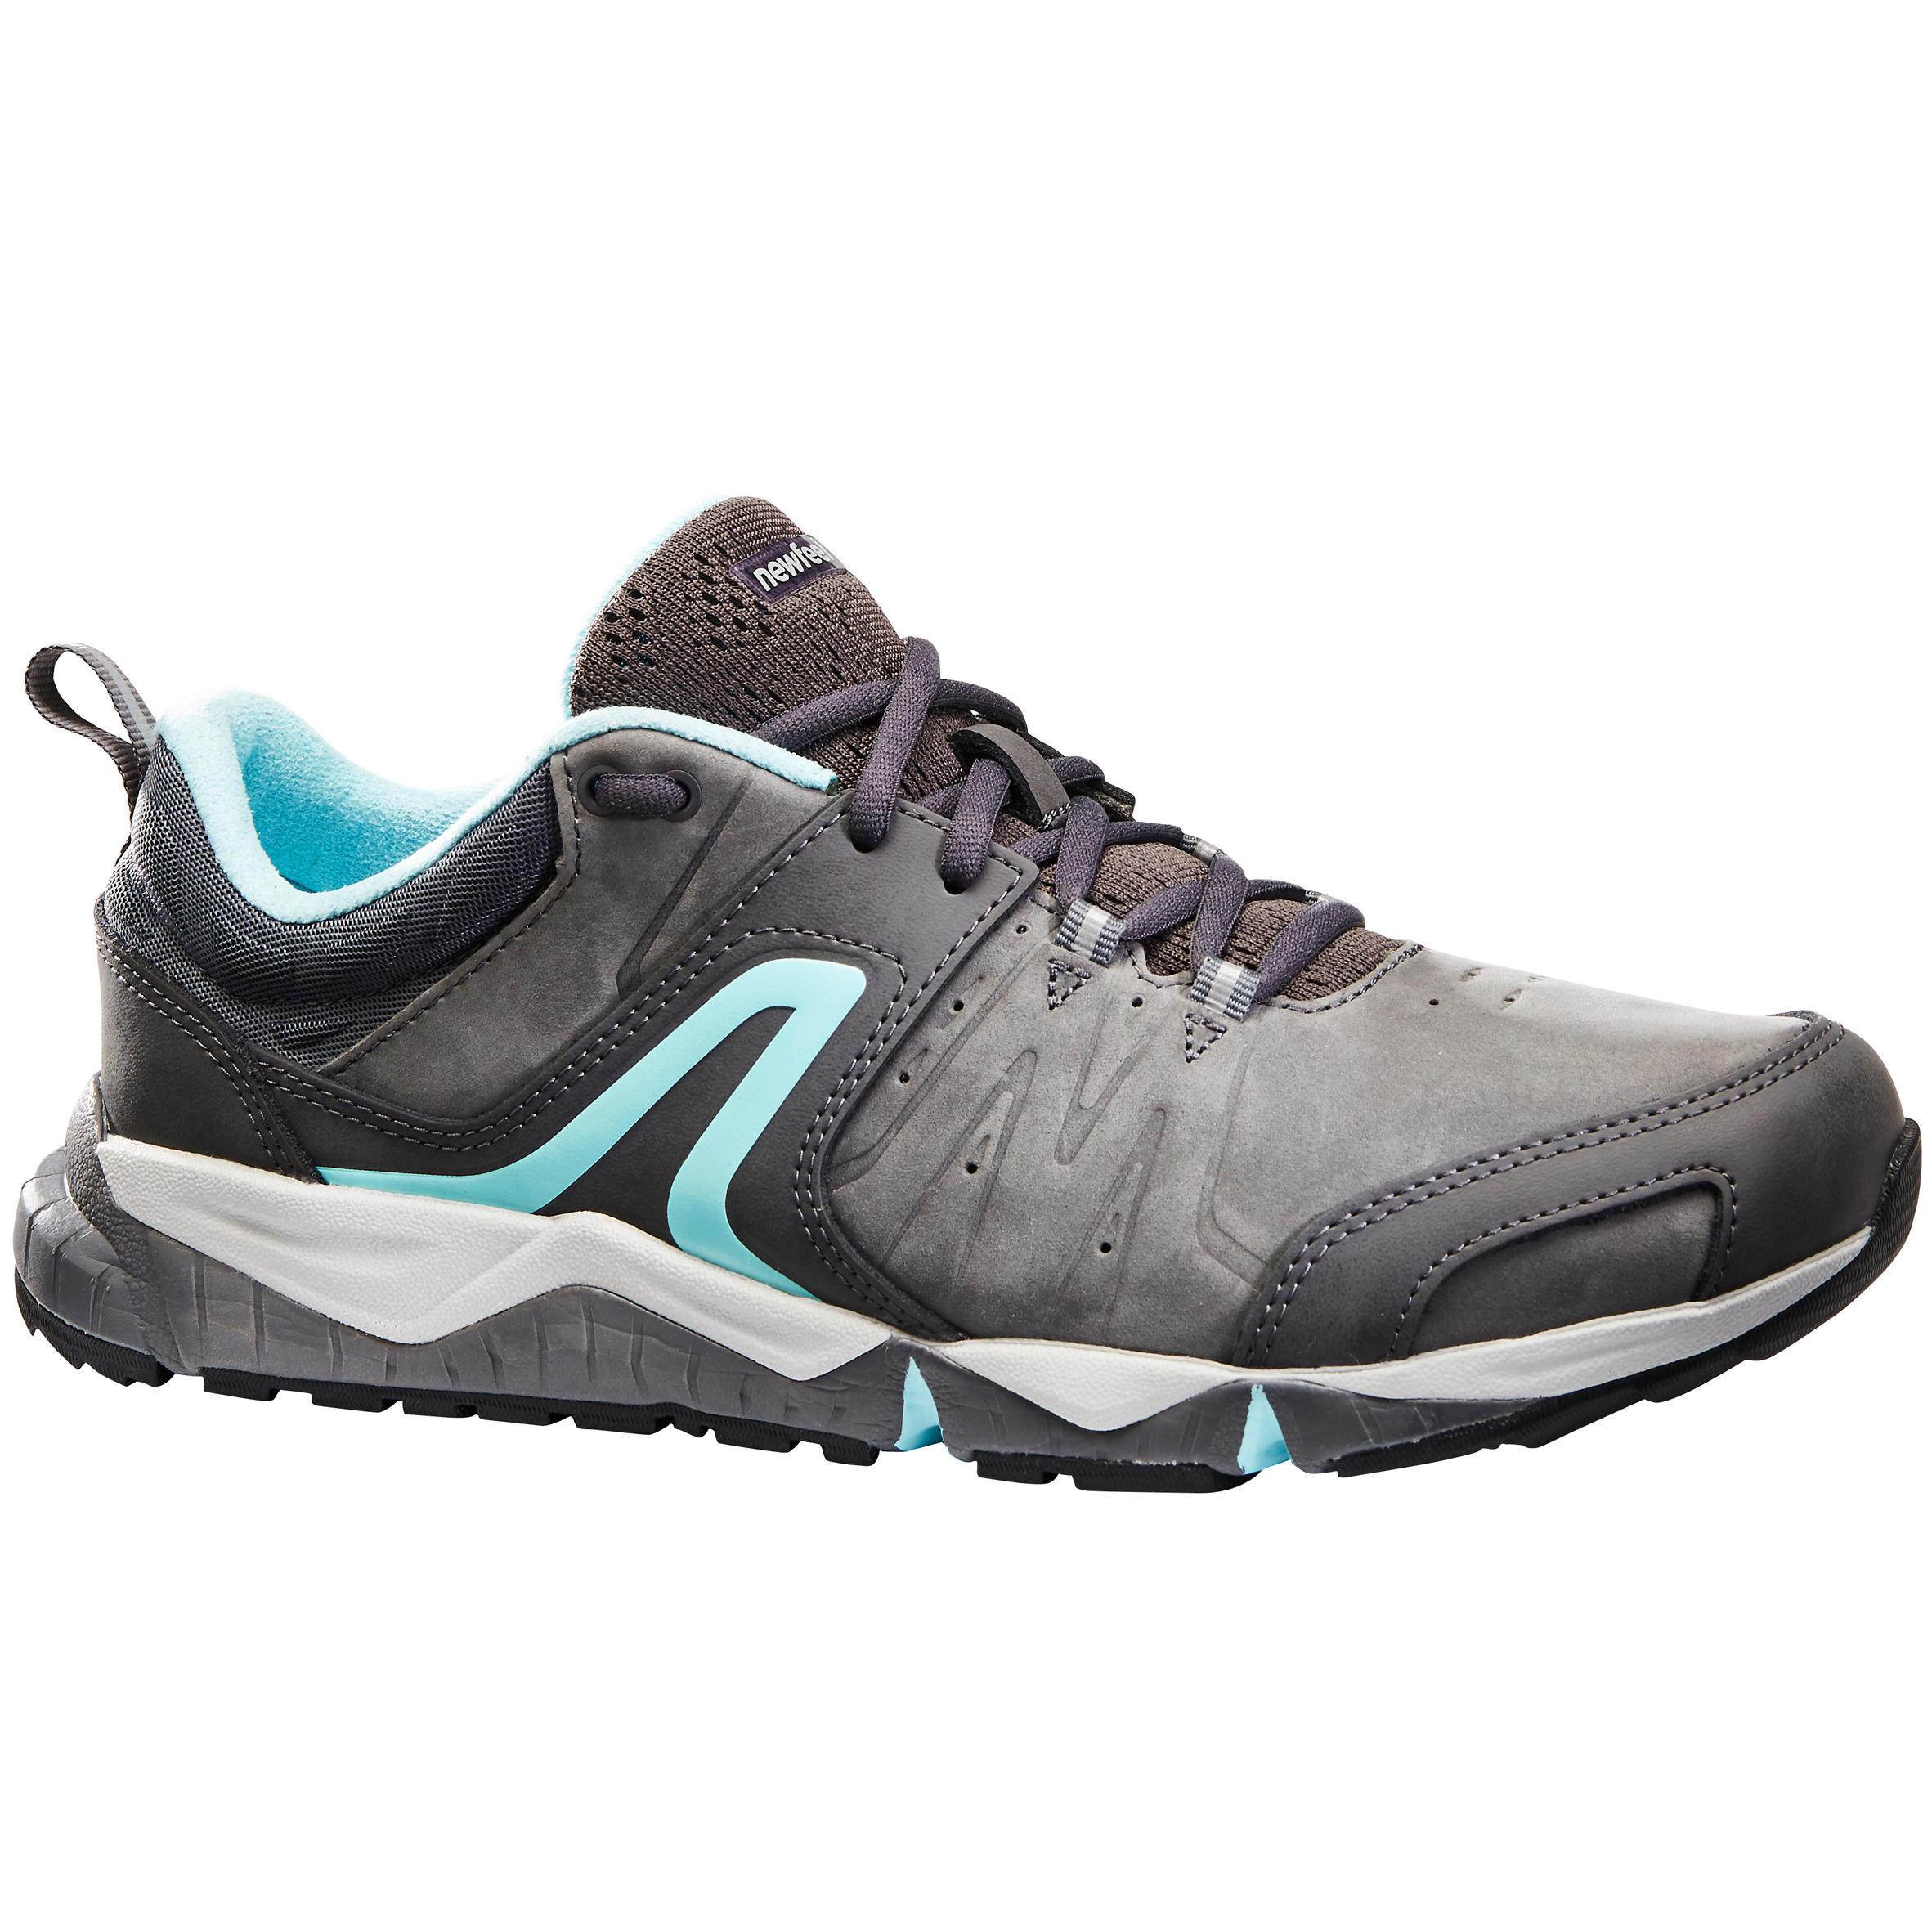 Walkingschuhe PW 940 Propulse Motion Leder Damen grau/blau | Schuhe > Sportschuhe > Walkingschuhe | Grau - Blau - Türkis | Leder | Newfeel